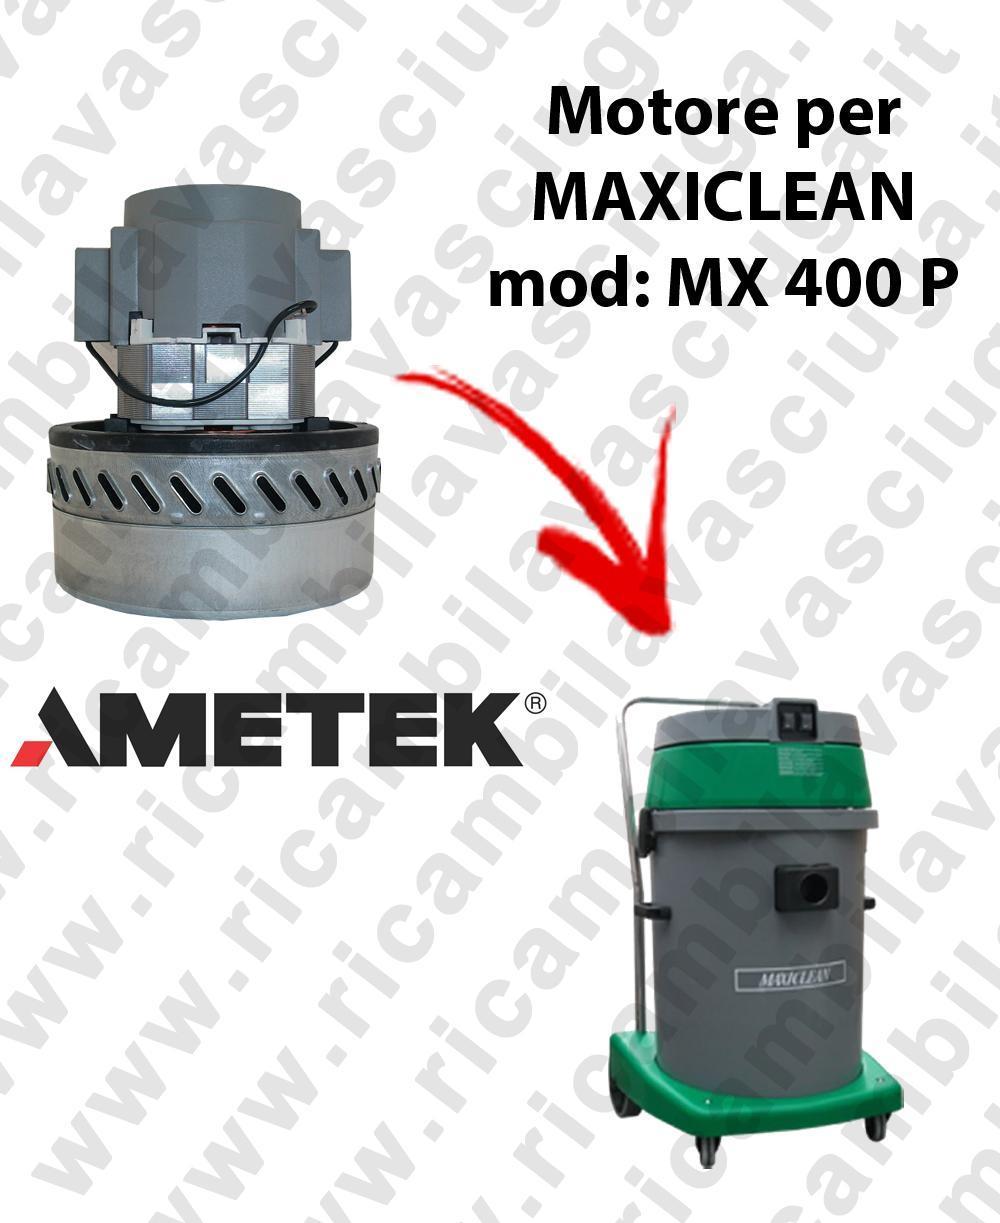 MX 400 P AMETEK vacuum motor for wet and dry vacuum cleaner MAXICLEAN